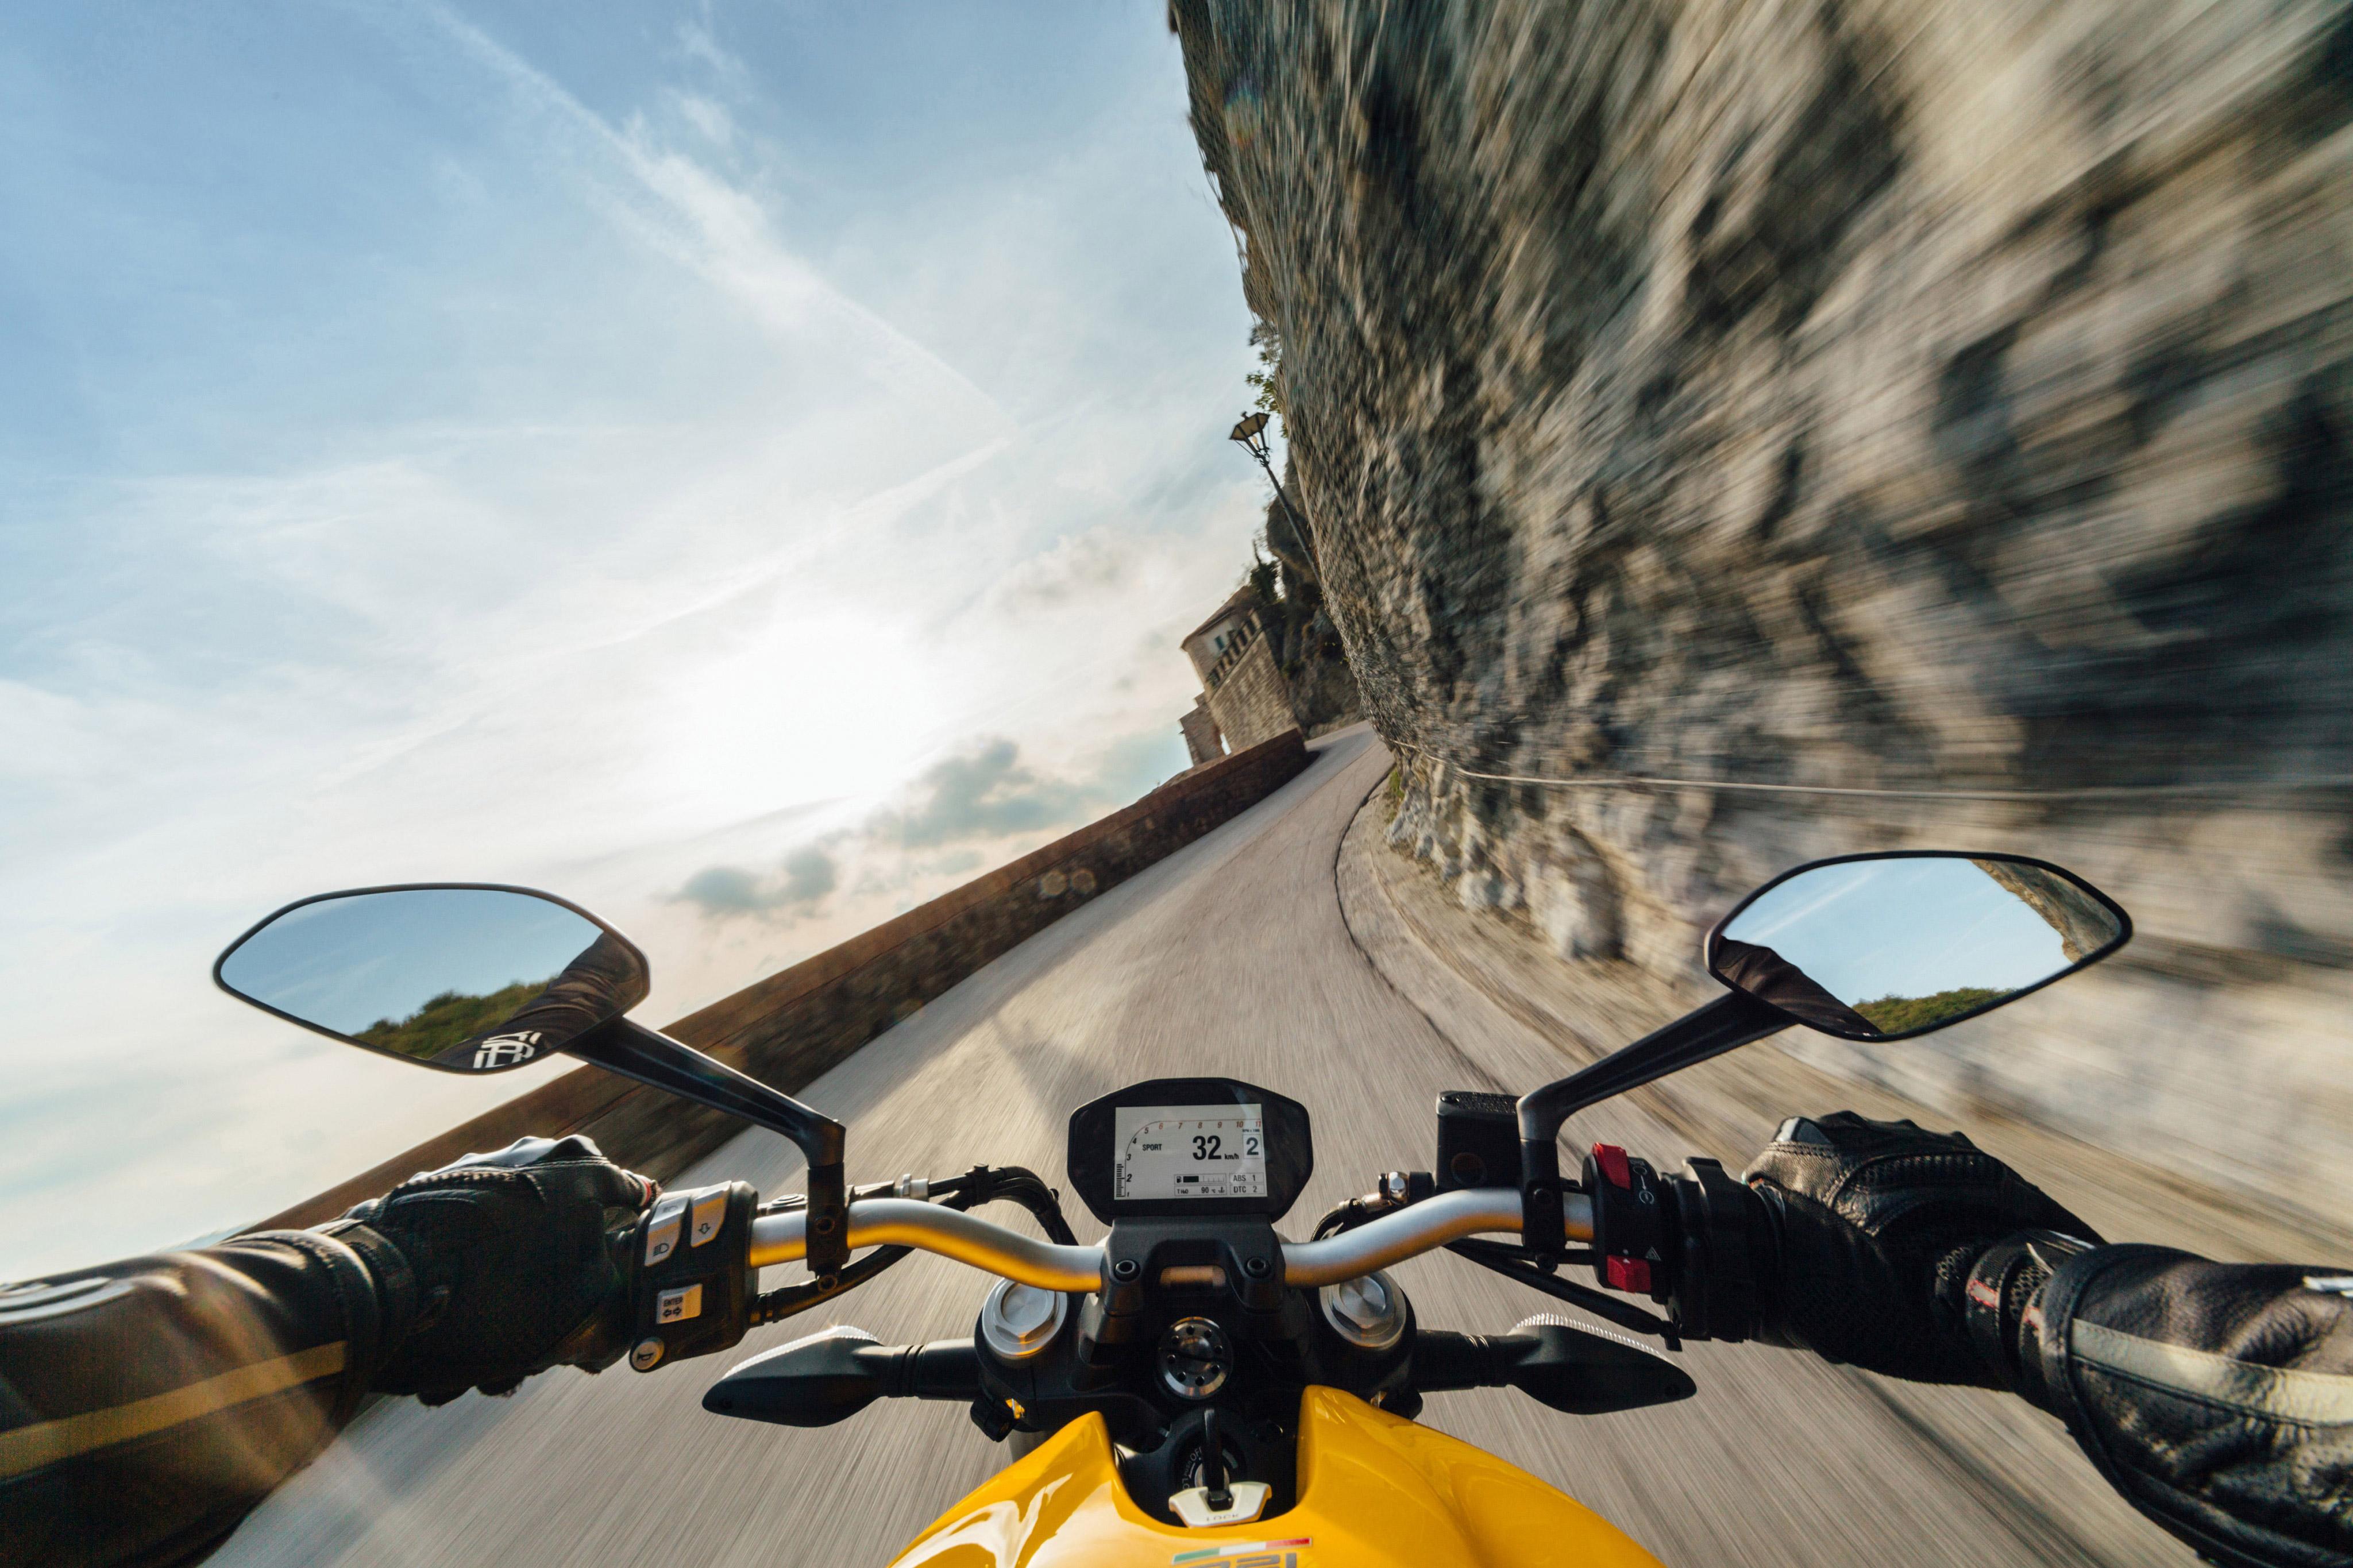 Ducati Monster 821 2017, HD Bikes, 4k Wallpapers, Images